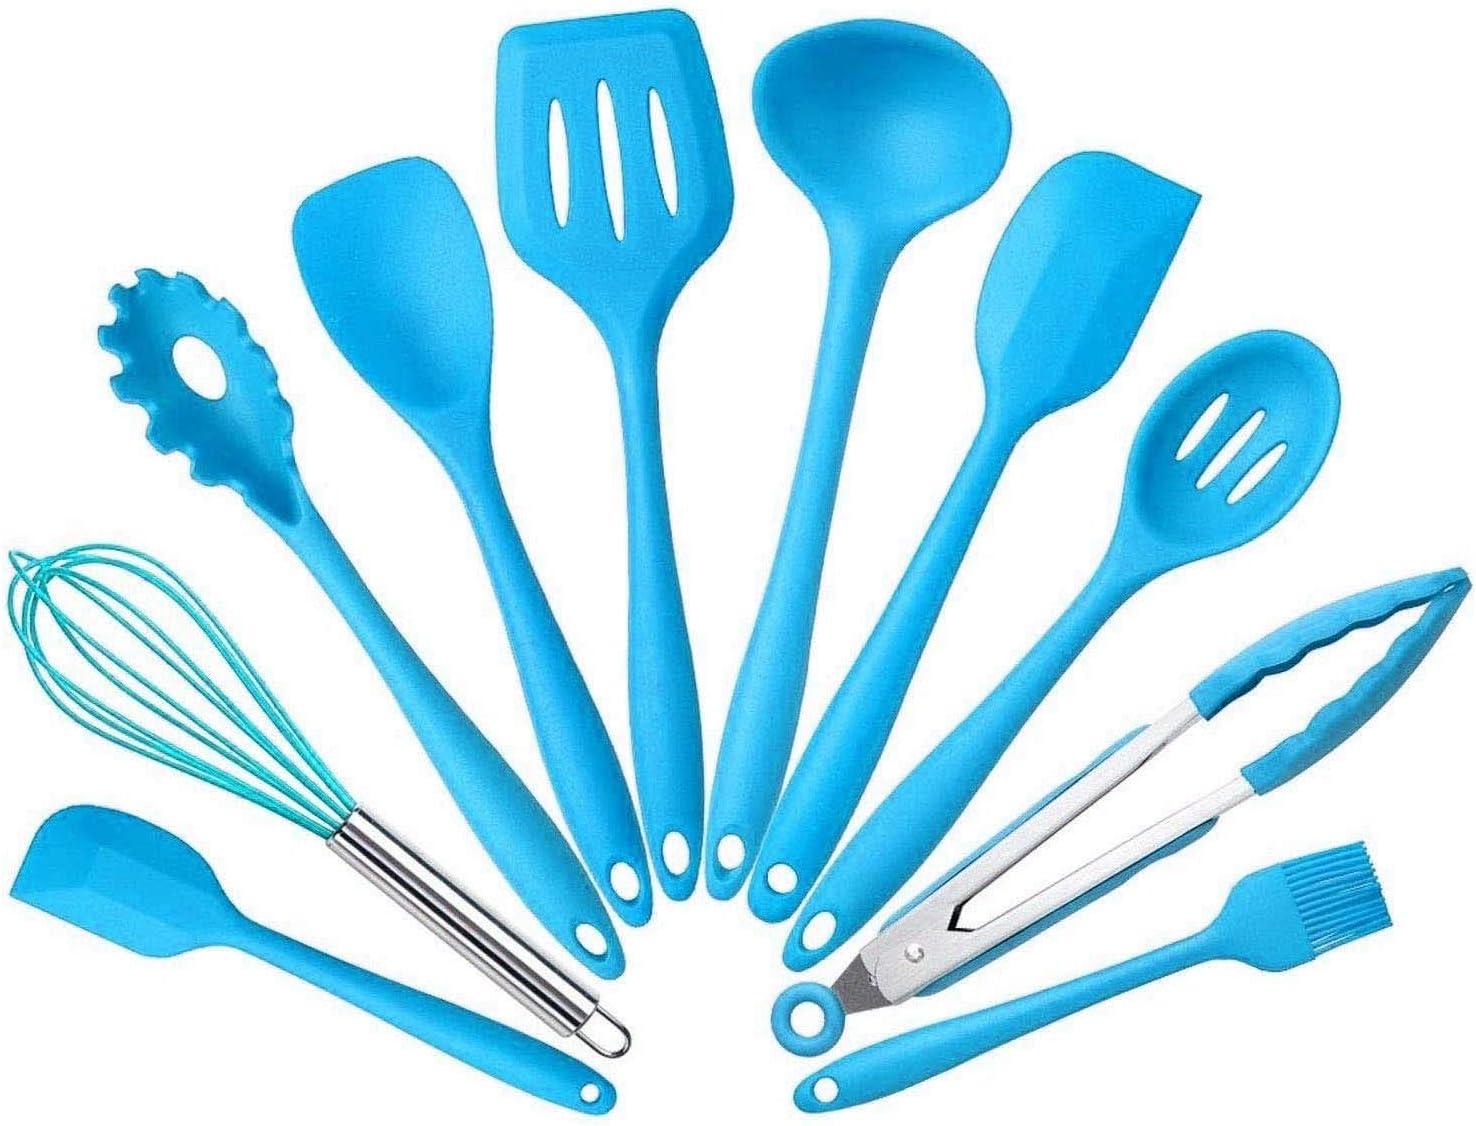 5Pcs/set Silicone Heat Resistant Kitchen Cooking Utensils Non-Stick Baking  Tool tongs ladle gadget by BonBon (Blue)